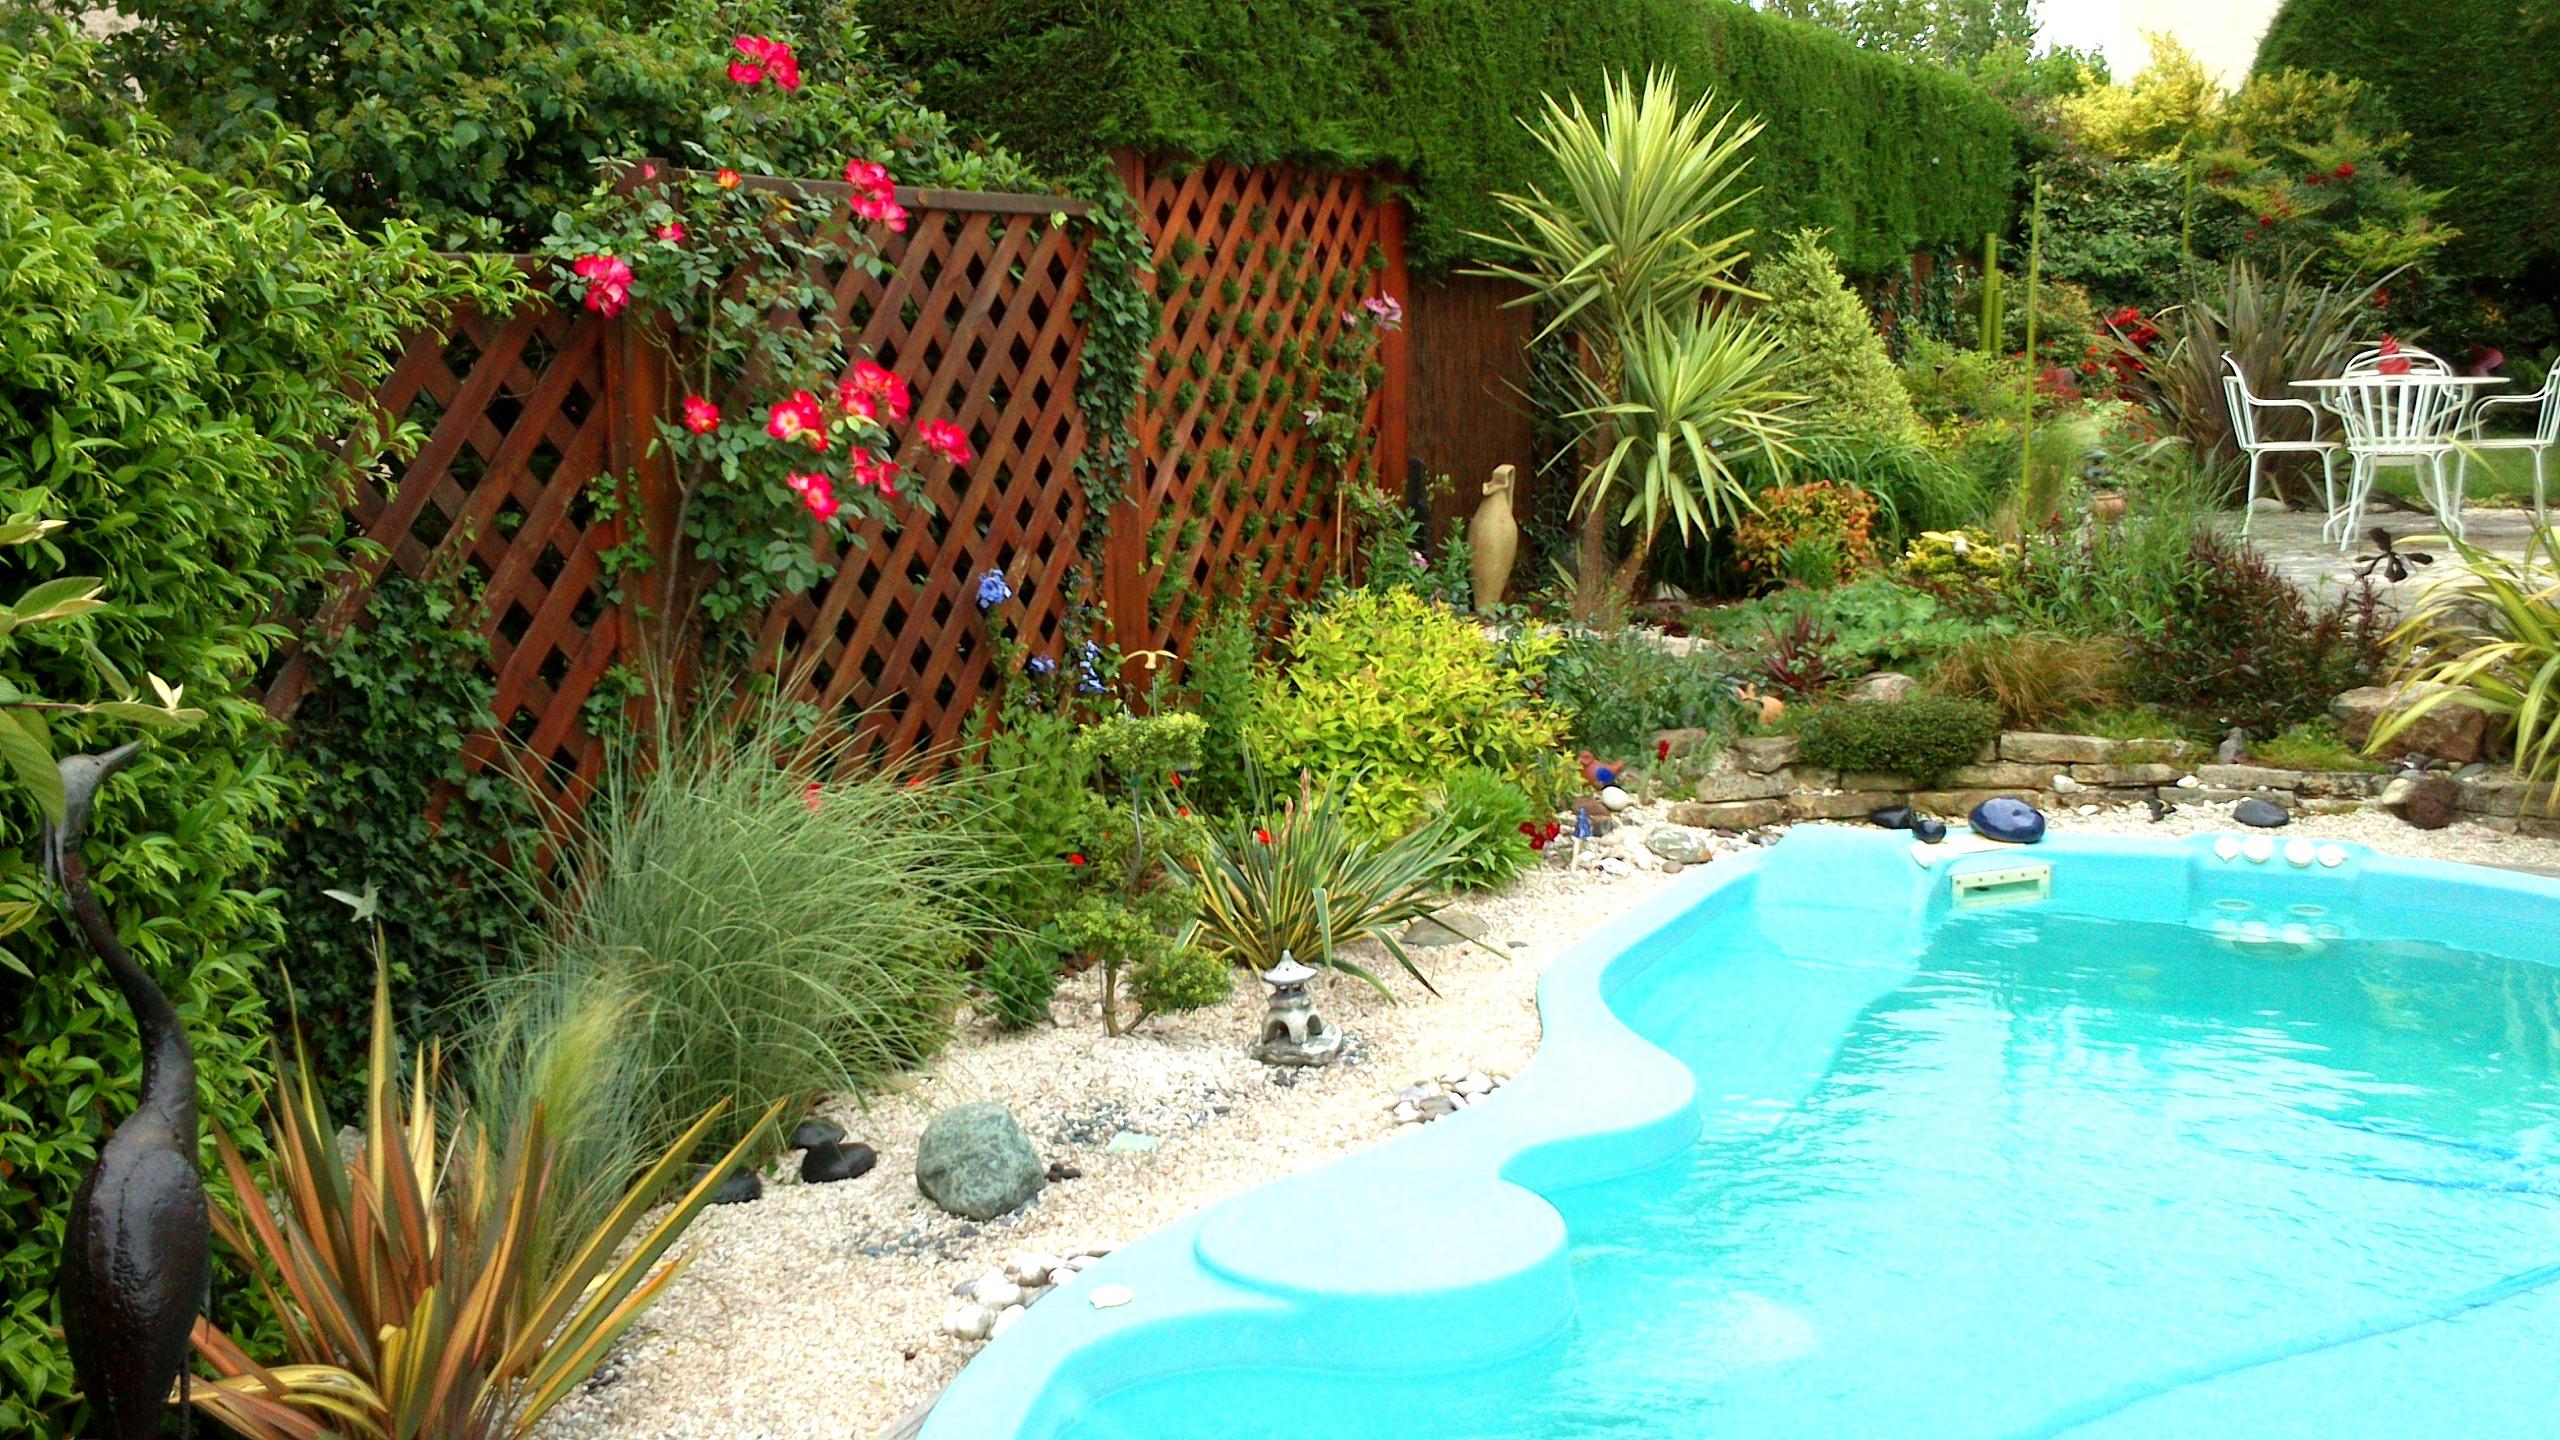 Idee Amenagement Tour De Piscine amenagement tour de piscine tour de piscine jardin nature